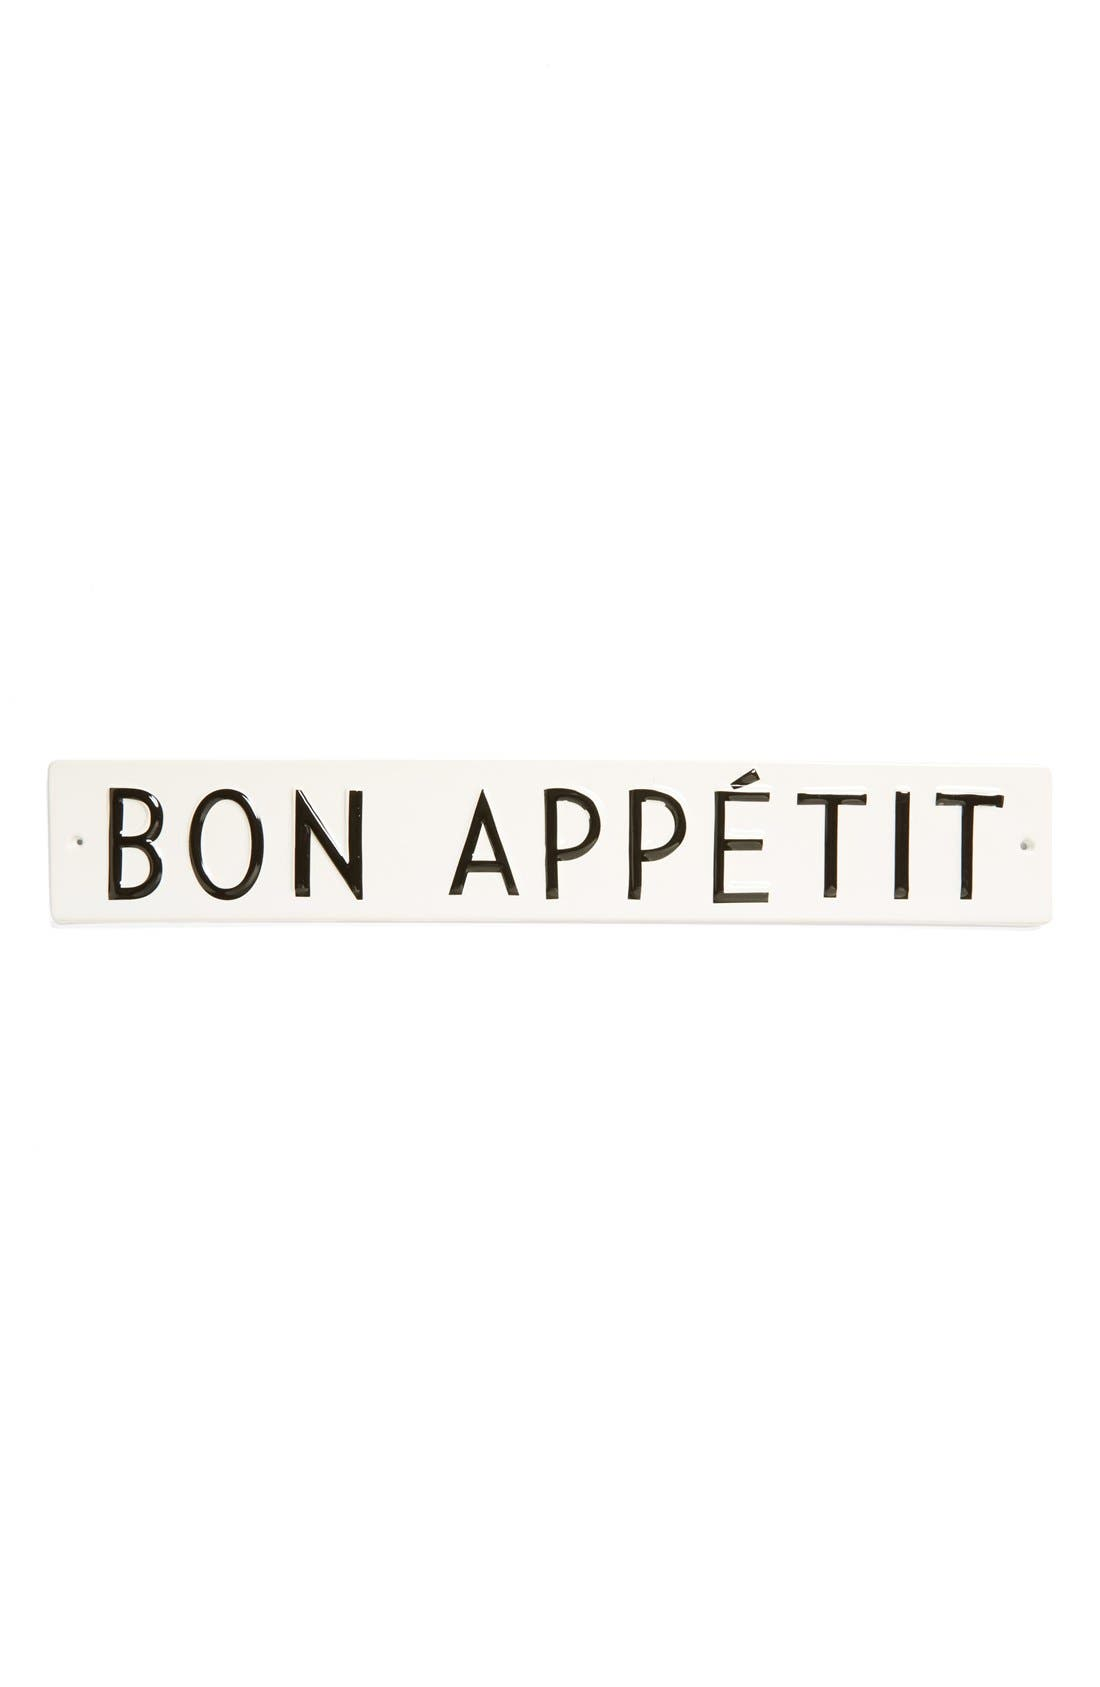 Alternate Image 1 Selected - Rosanna 'Bon Appétit' Porcelain Wall Art